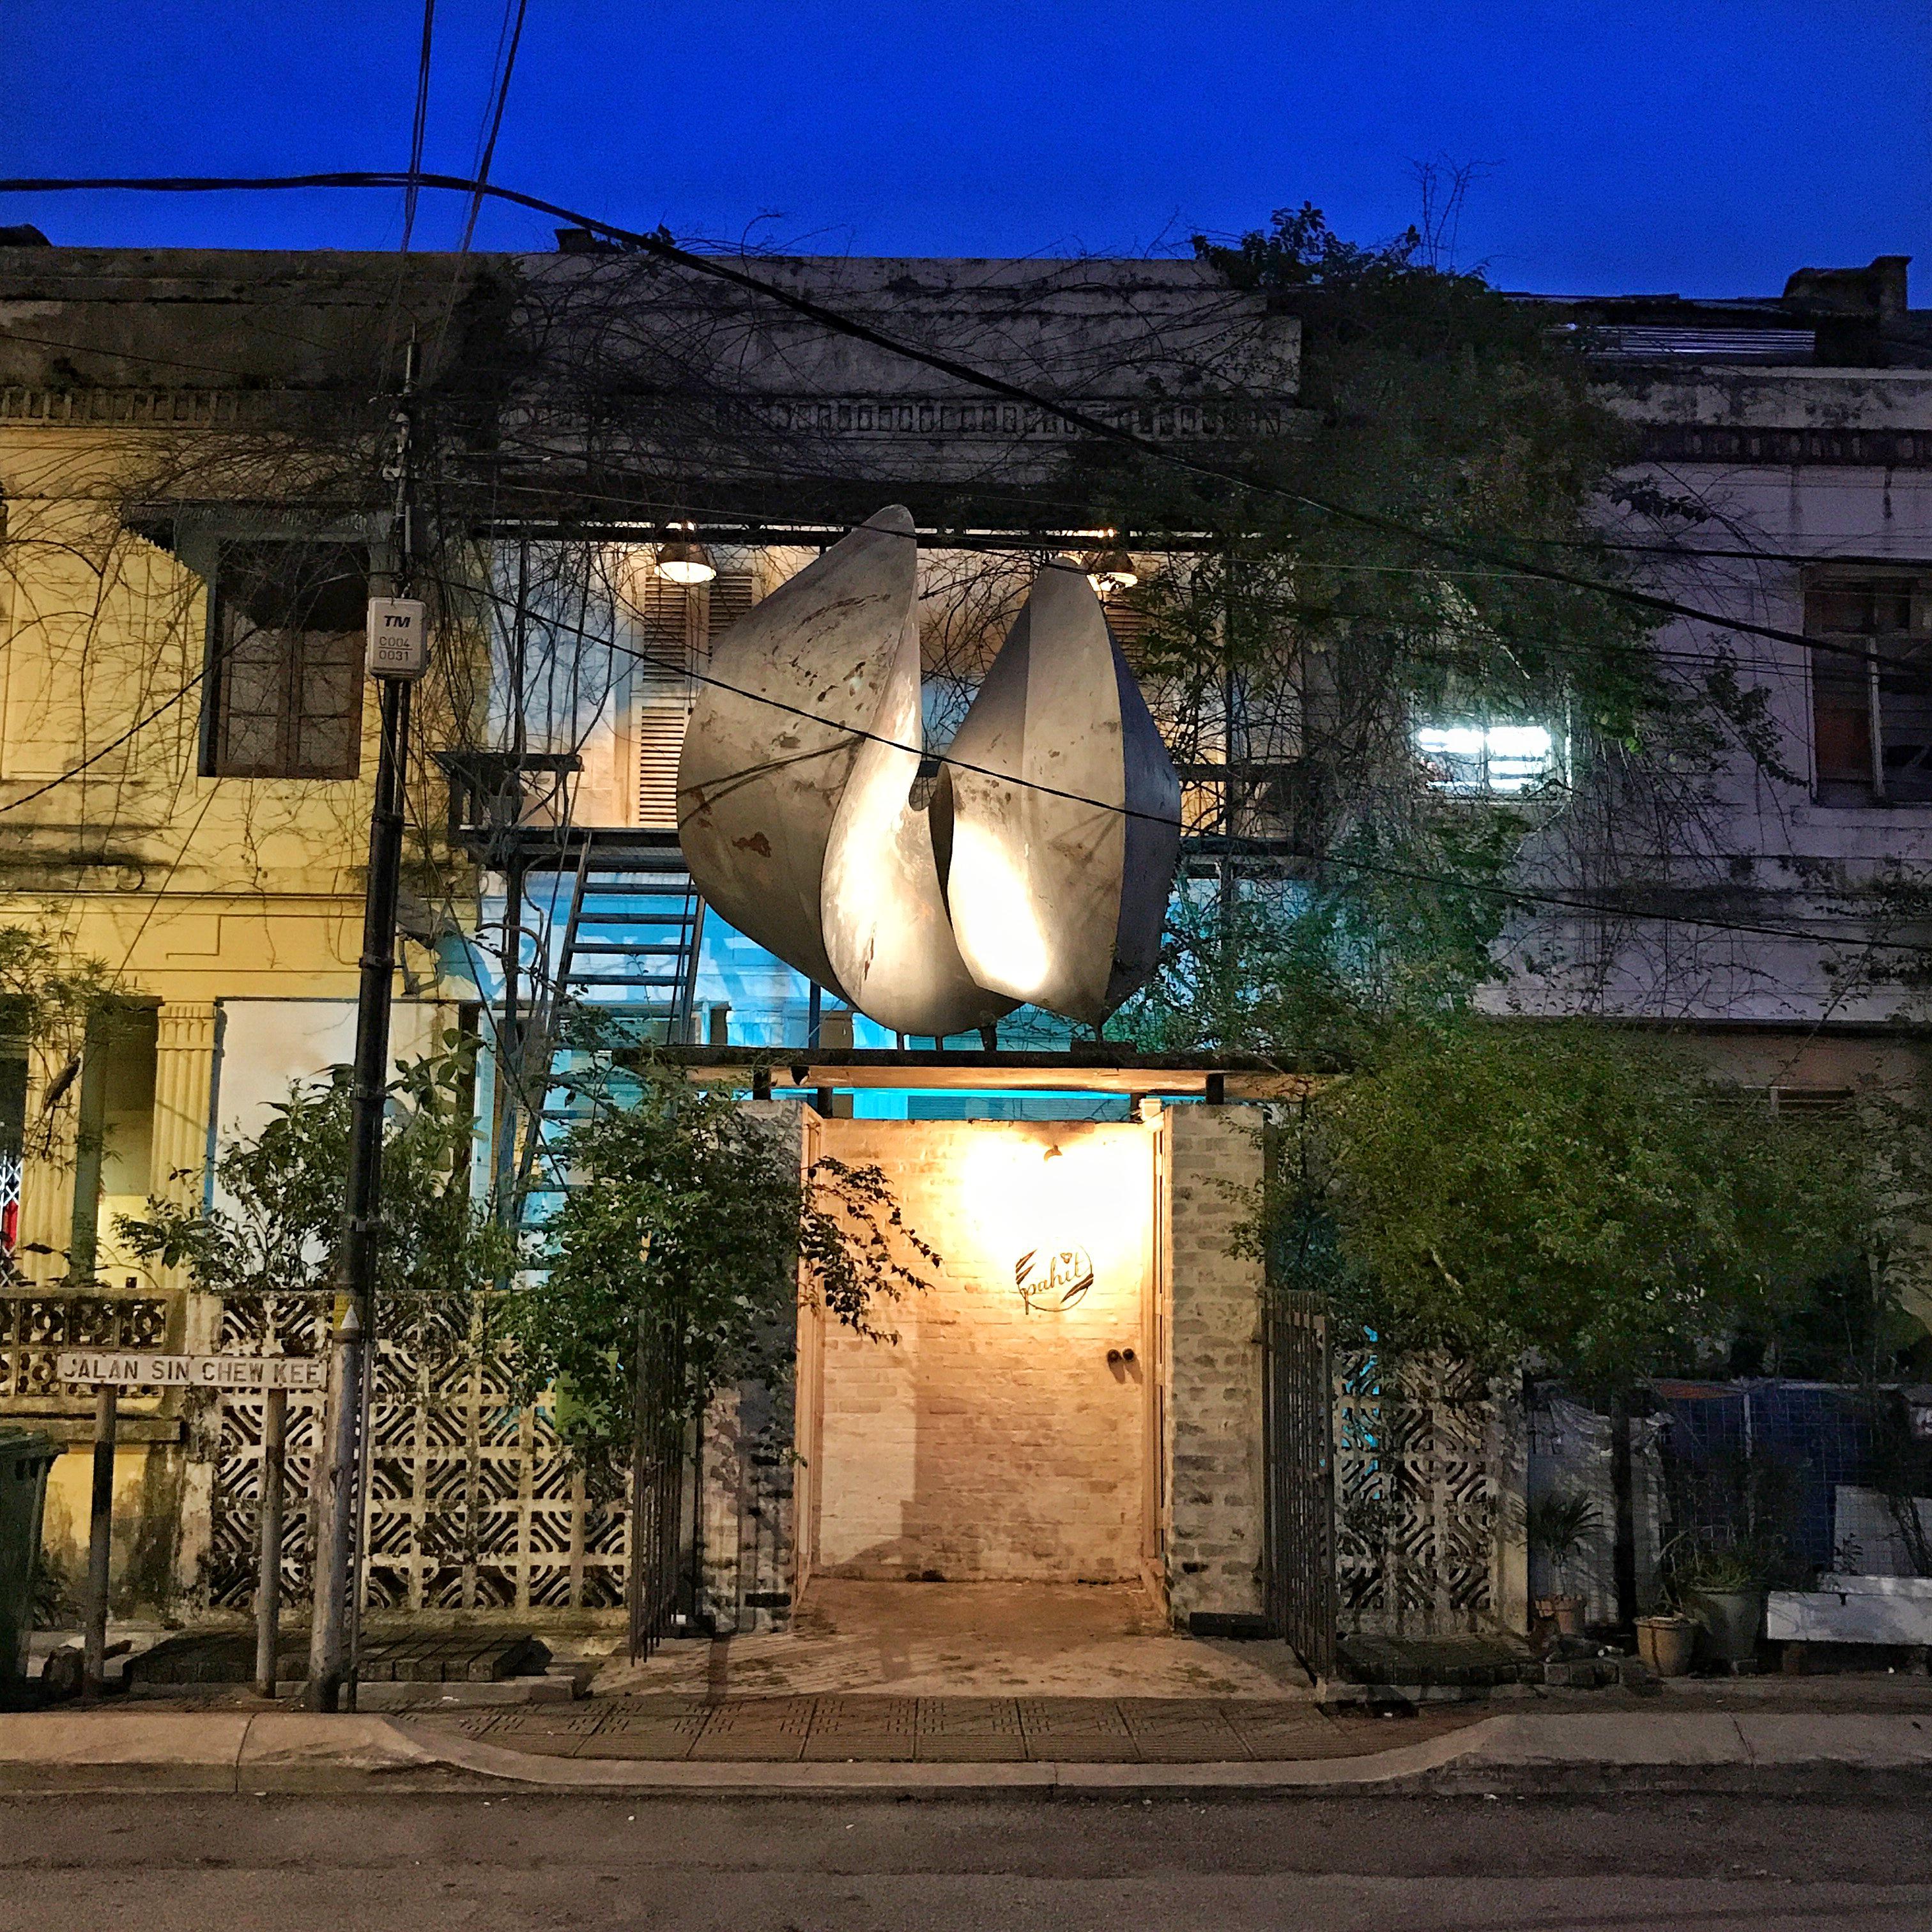 Pahit, hidden gin bar on Jalan Sin Chew Kee